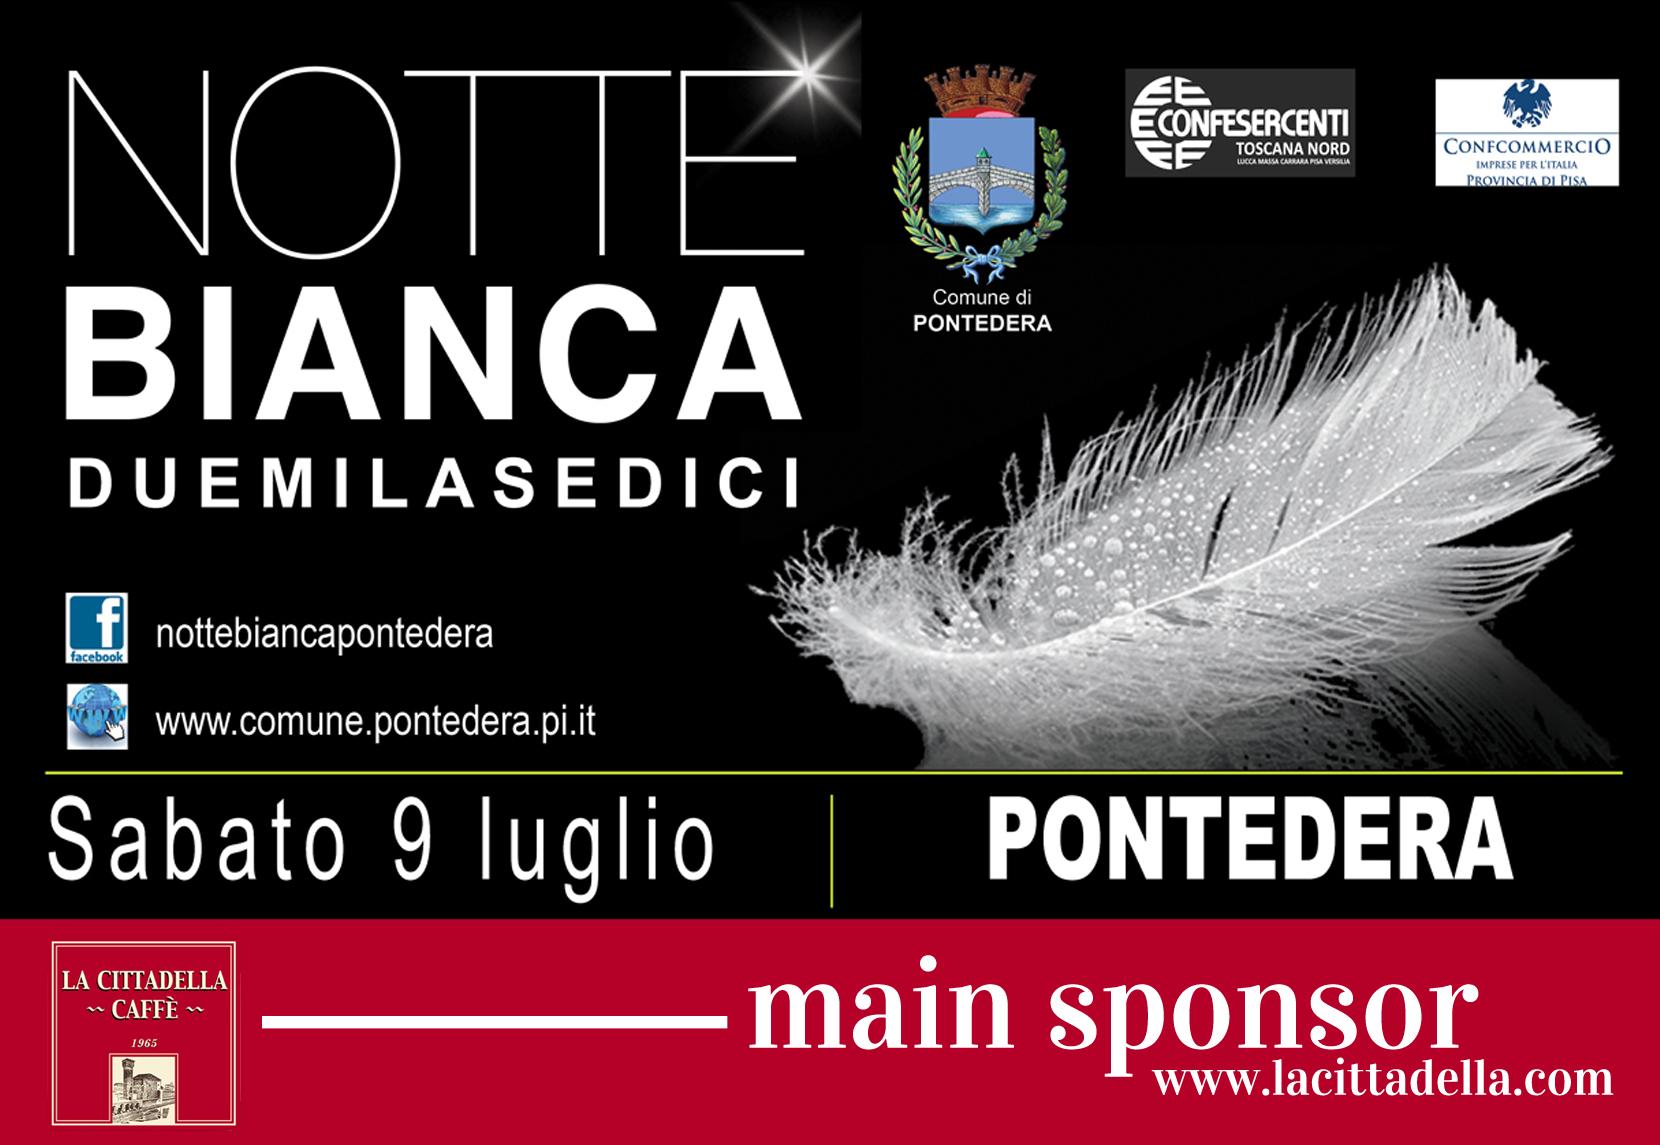 La-Cittadella-Caffè-Main-Sponsor-Notte-Bianca-Pontedera